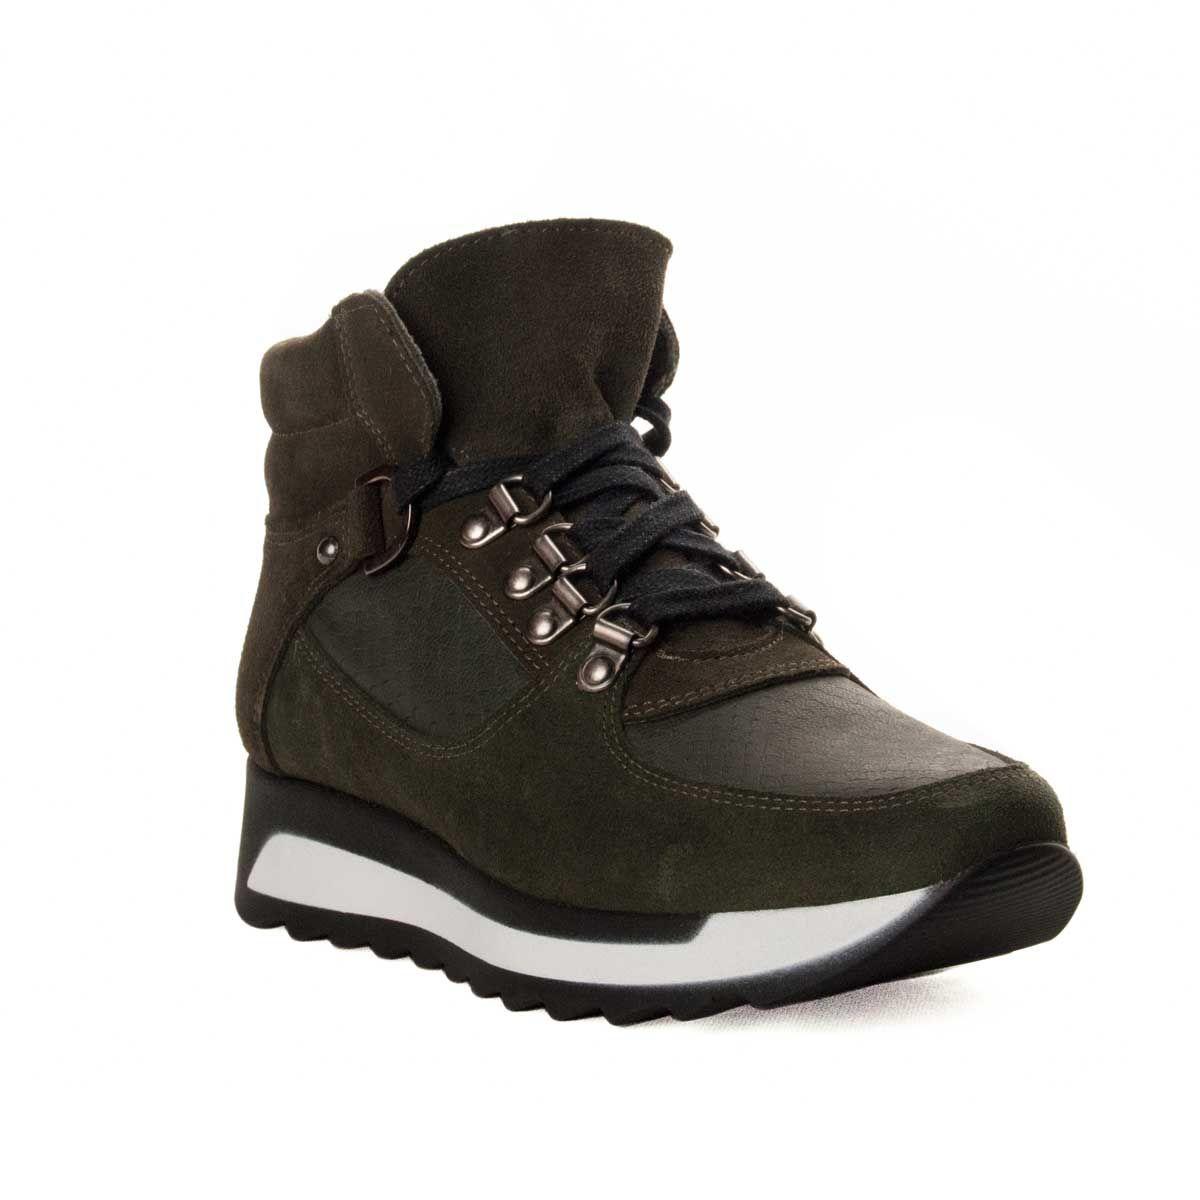 Montevita Sneaker Boot in Green